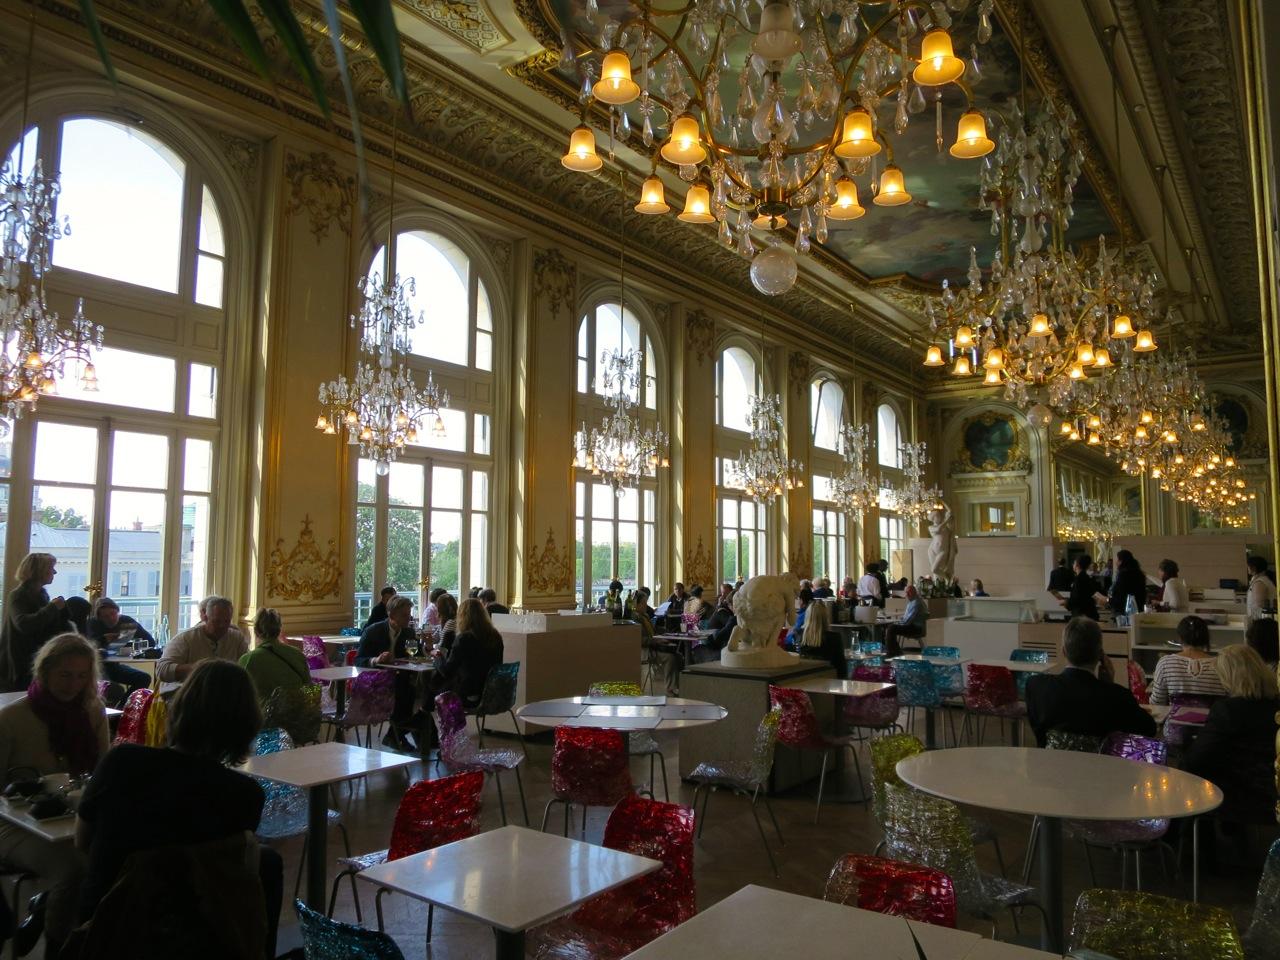 Paris 4-Musee d'Orsay 10